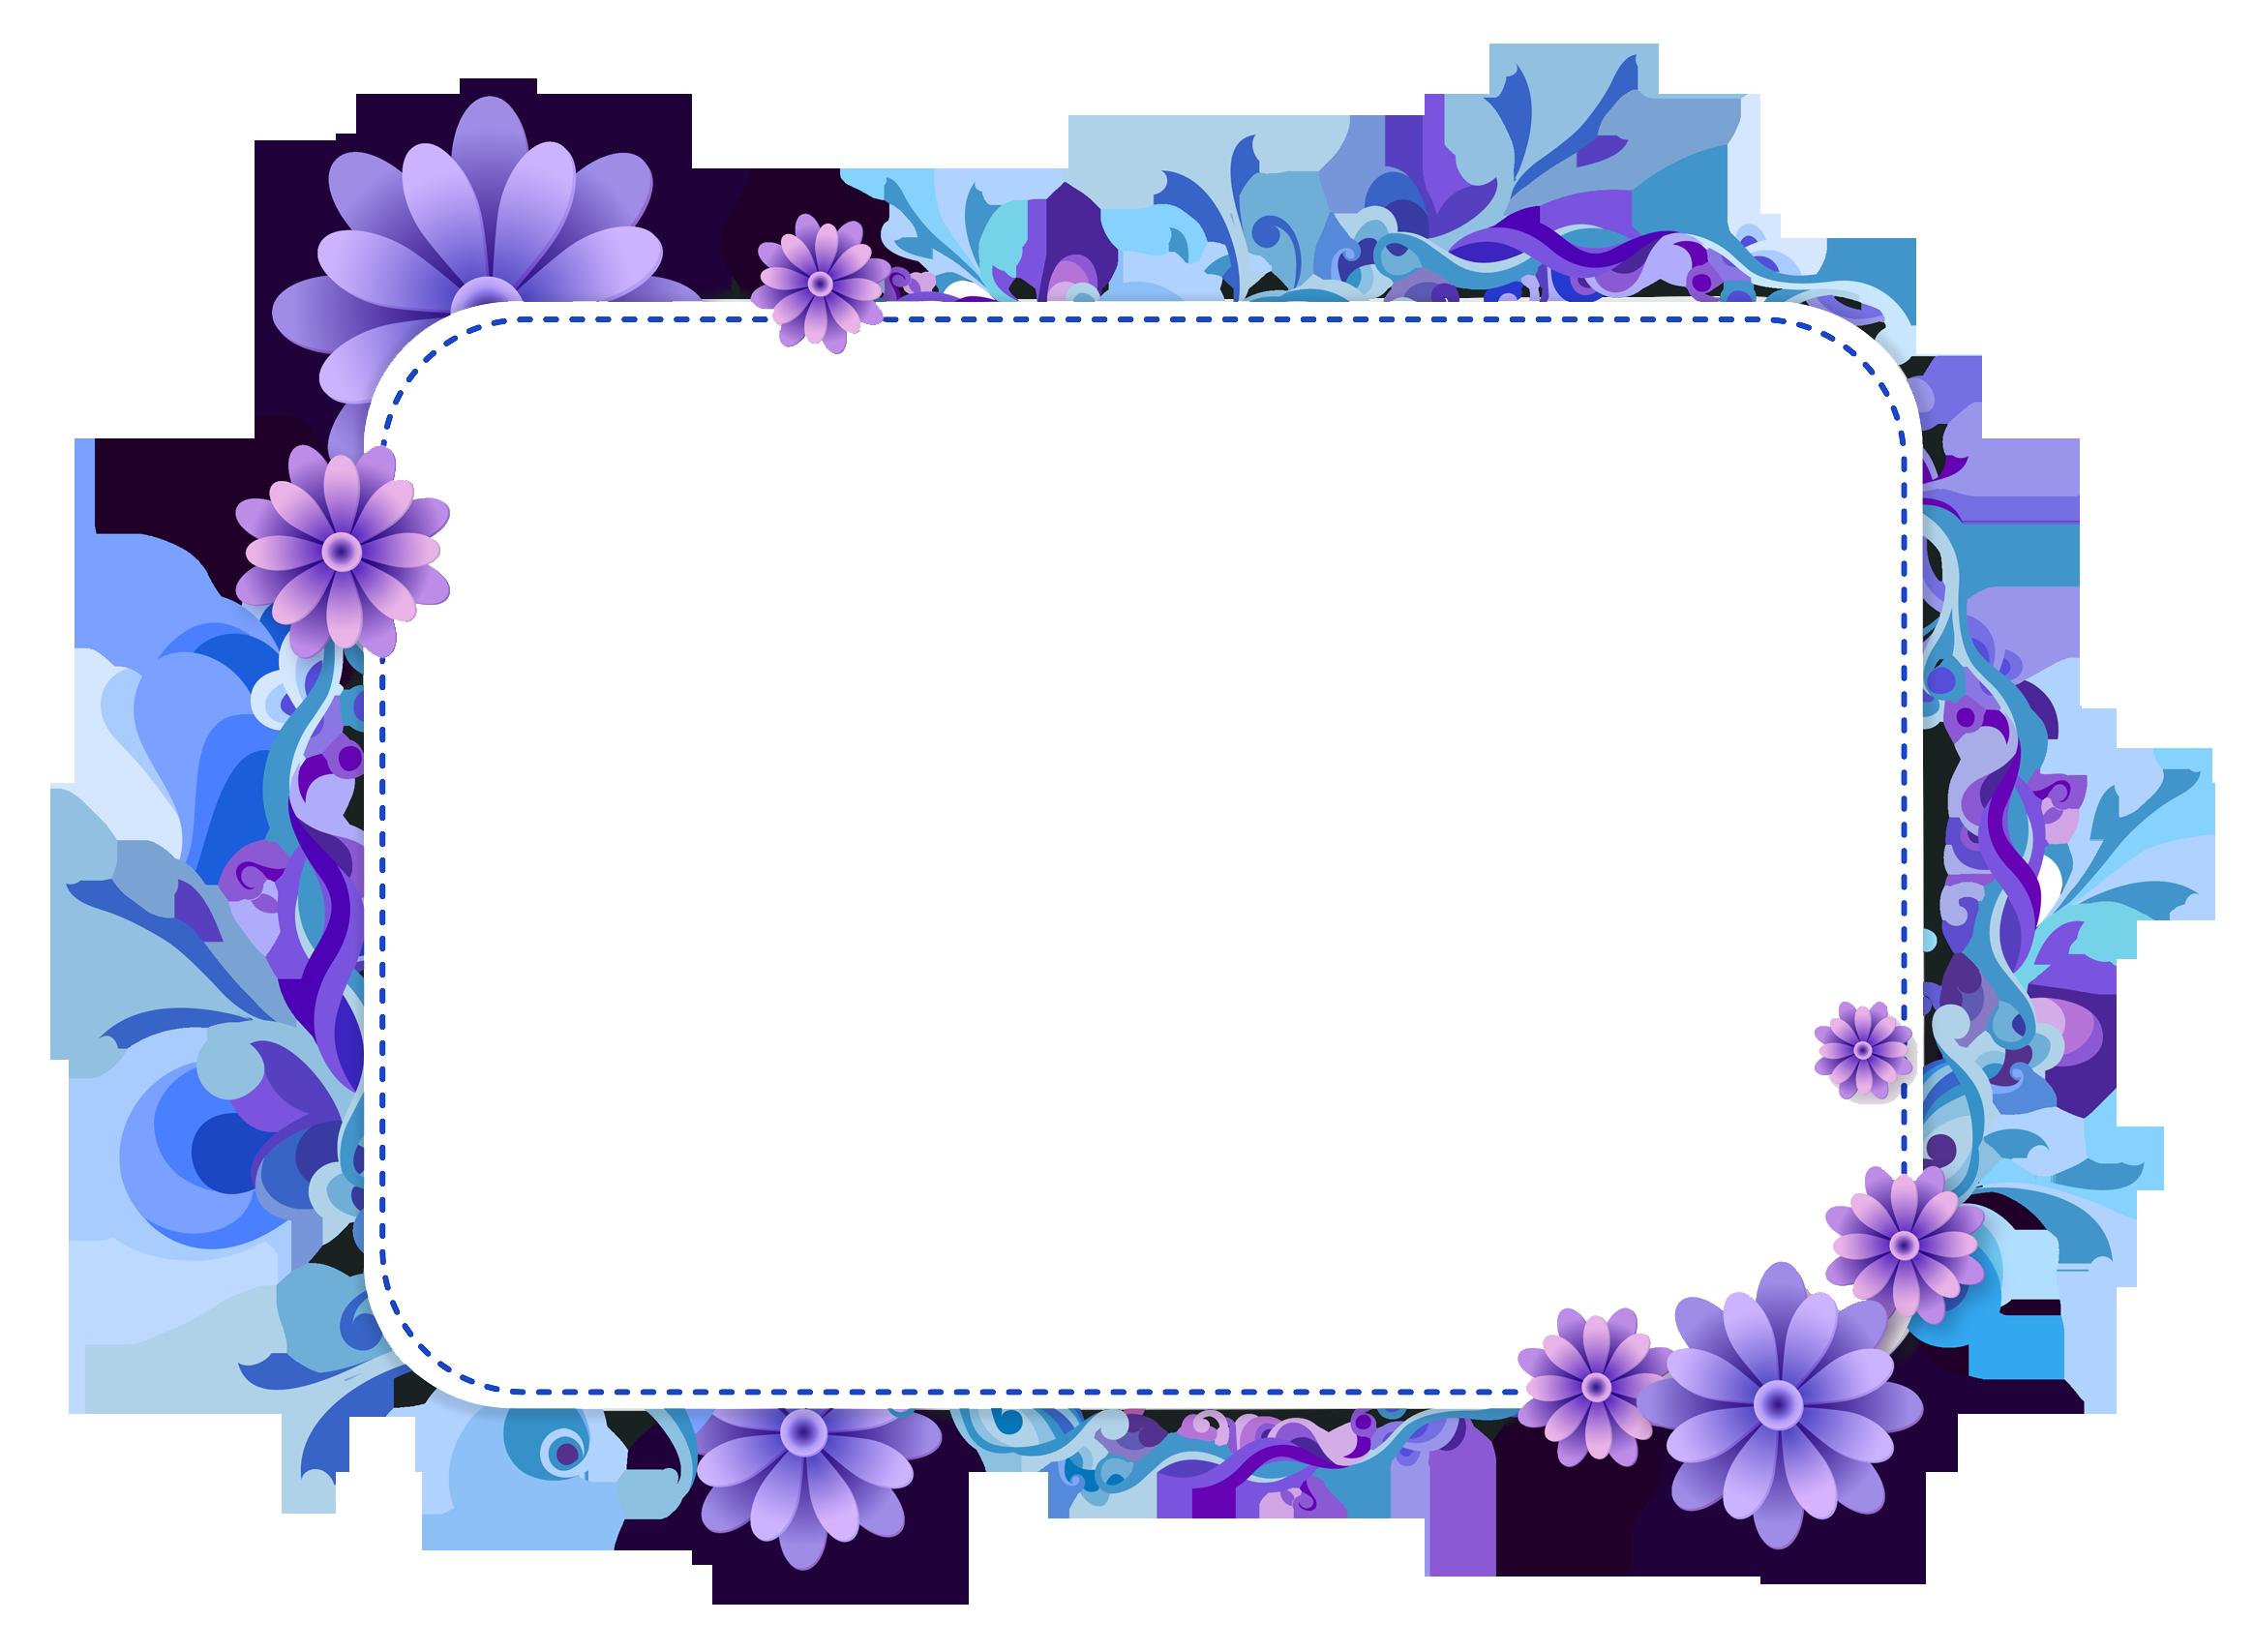 Ios App Add Frames To Your Pictures Http Bit Ly 1axfrsc Poster Bunga Bunga Bingkai